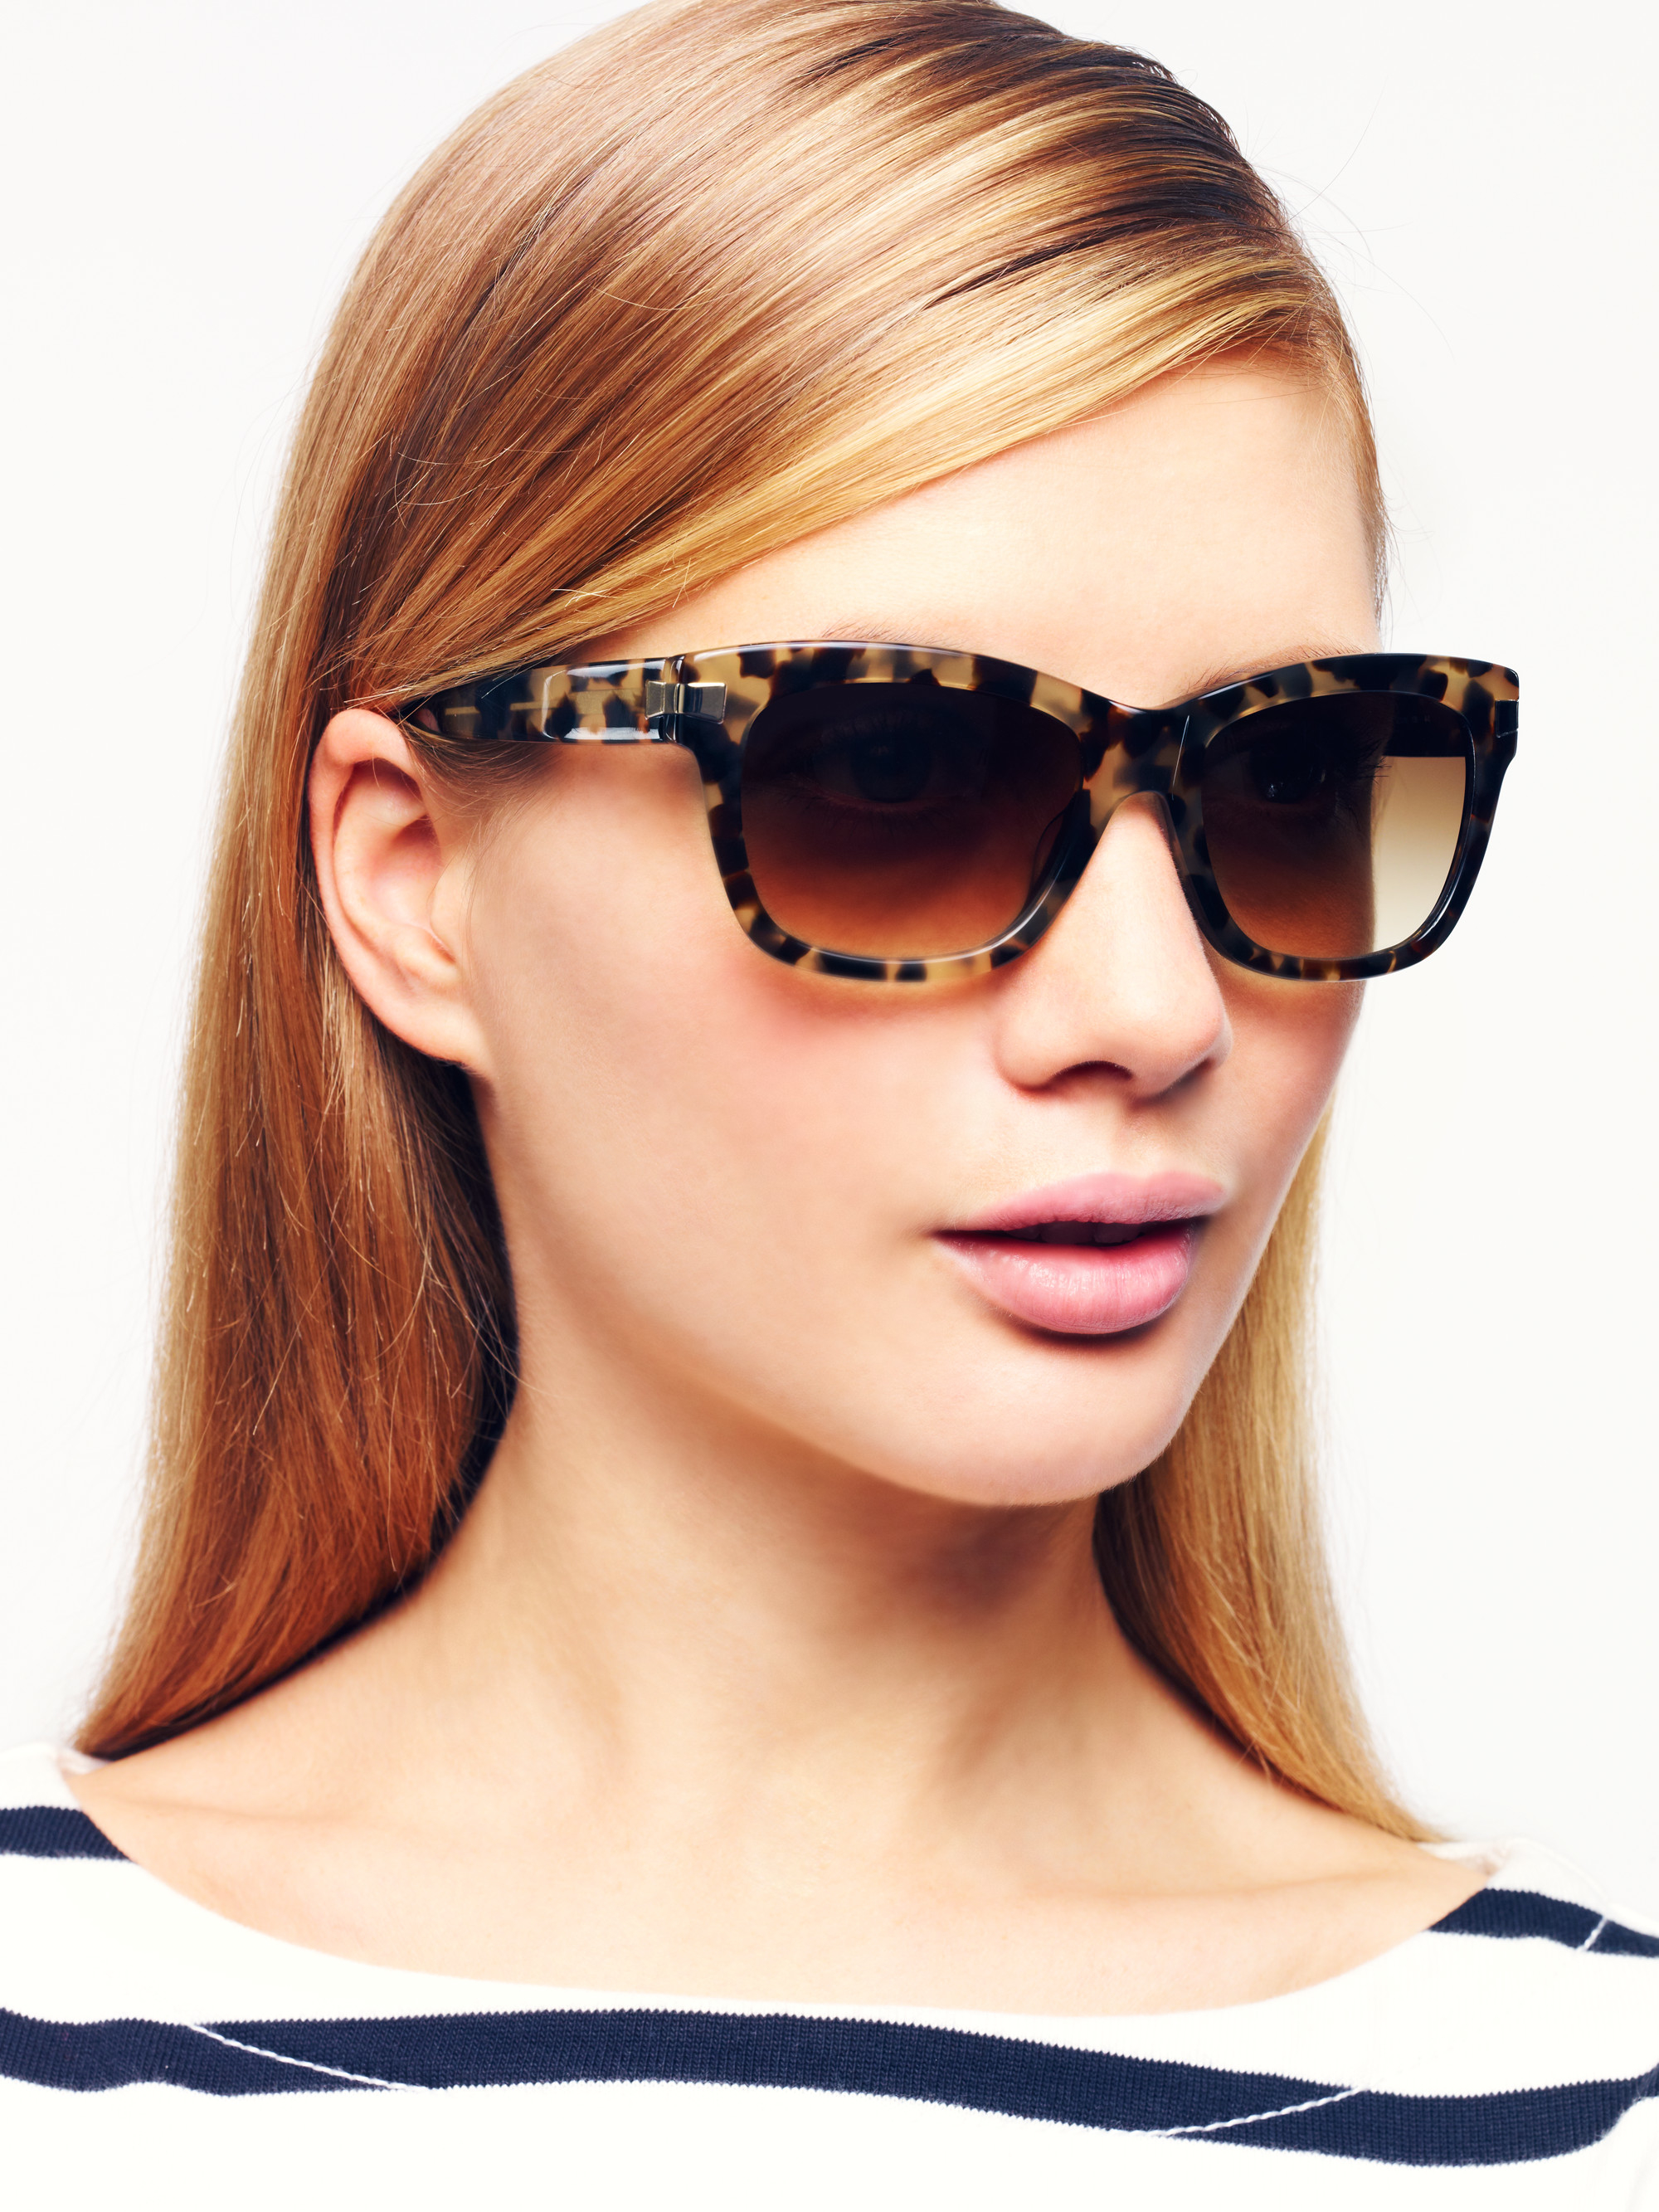 Kate Spade Autumn Sunglasses - Lyst